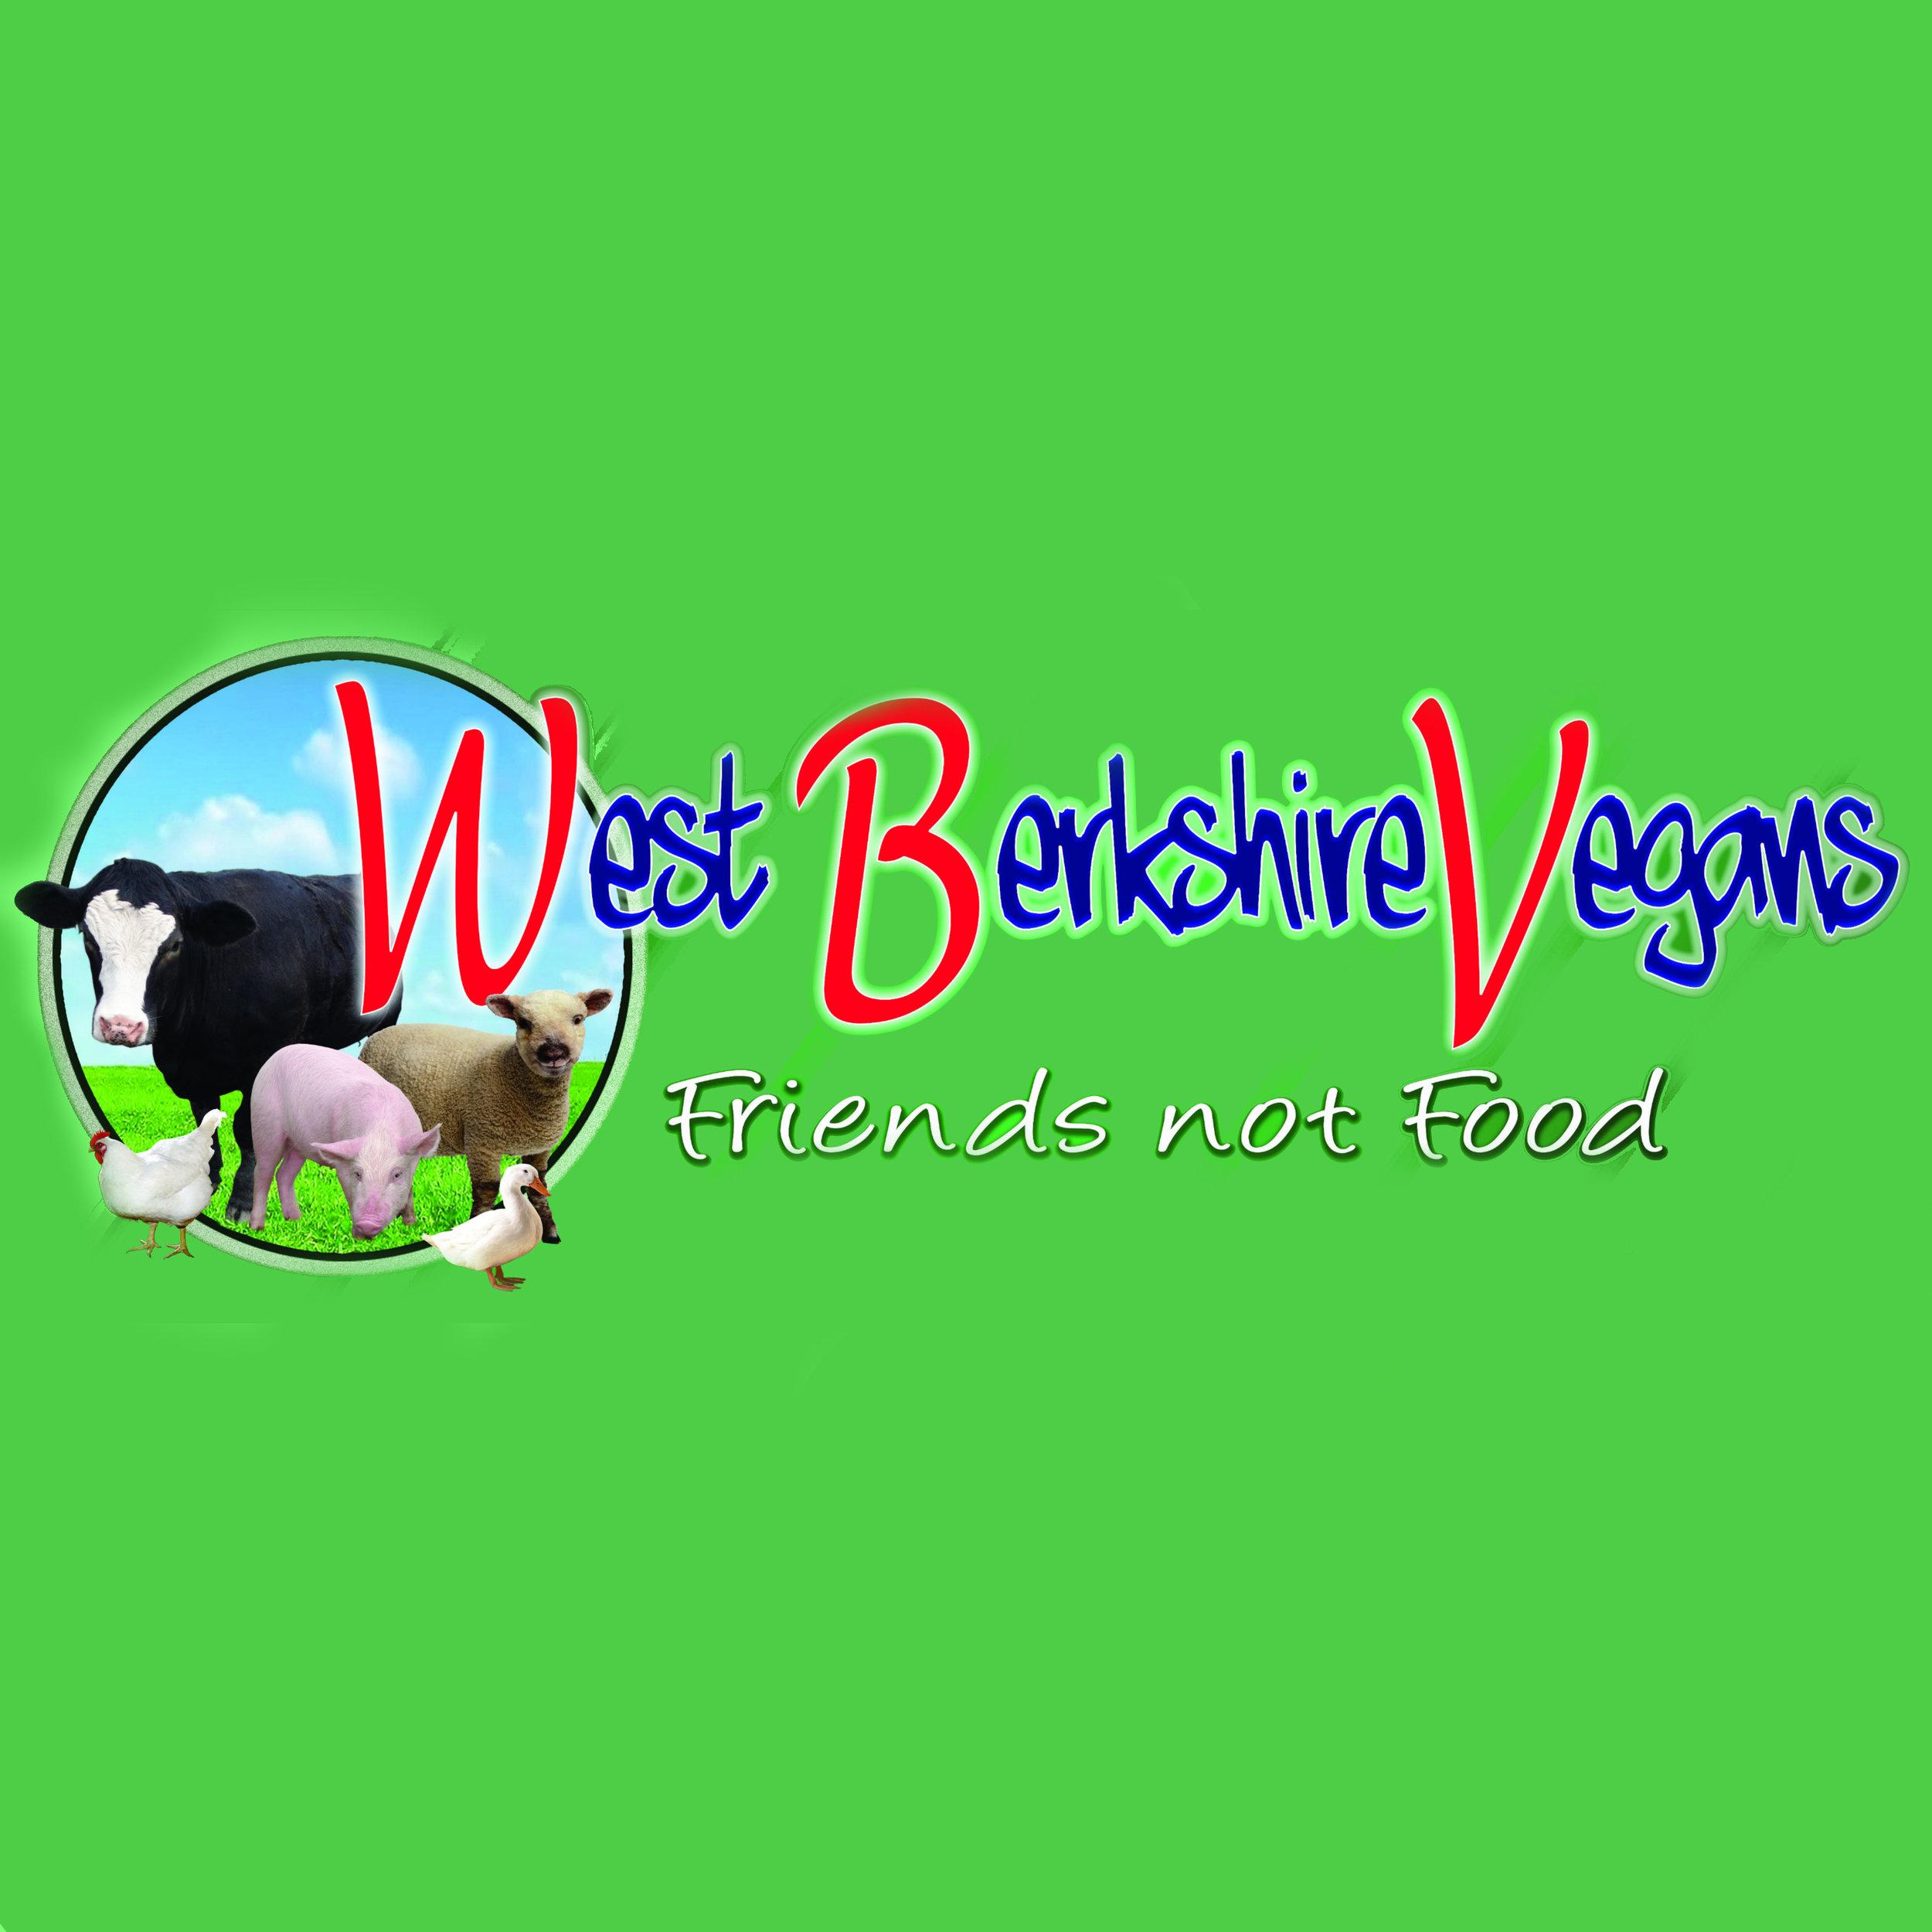 West Berkshire Vegans